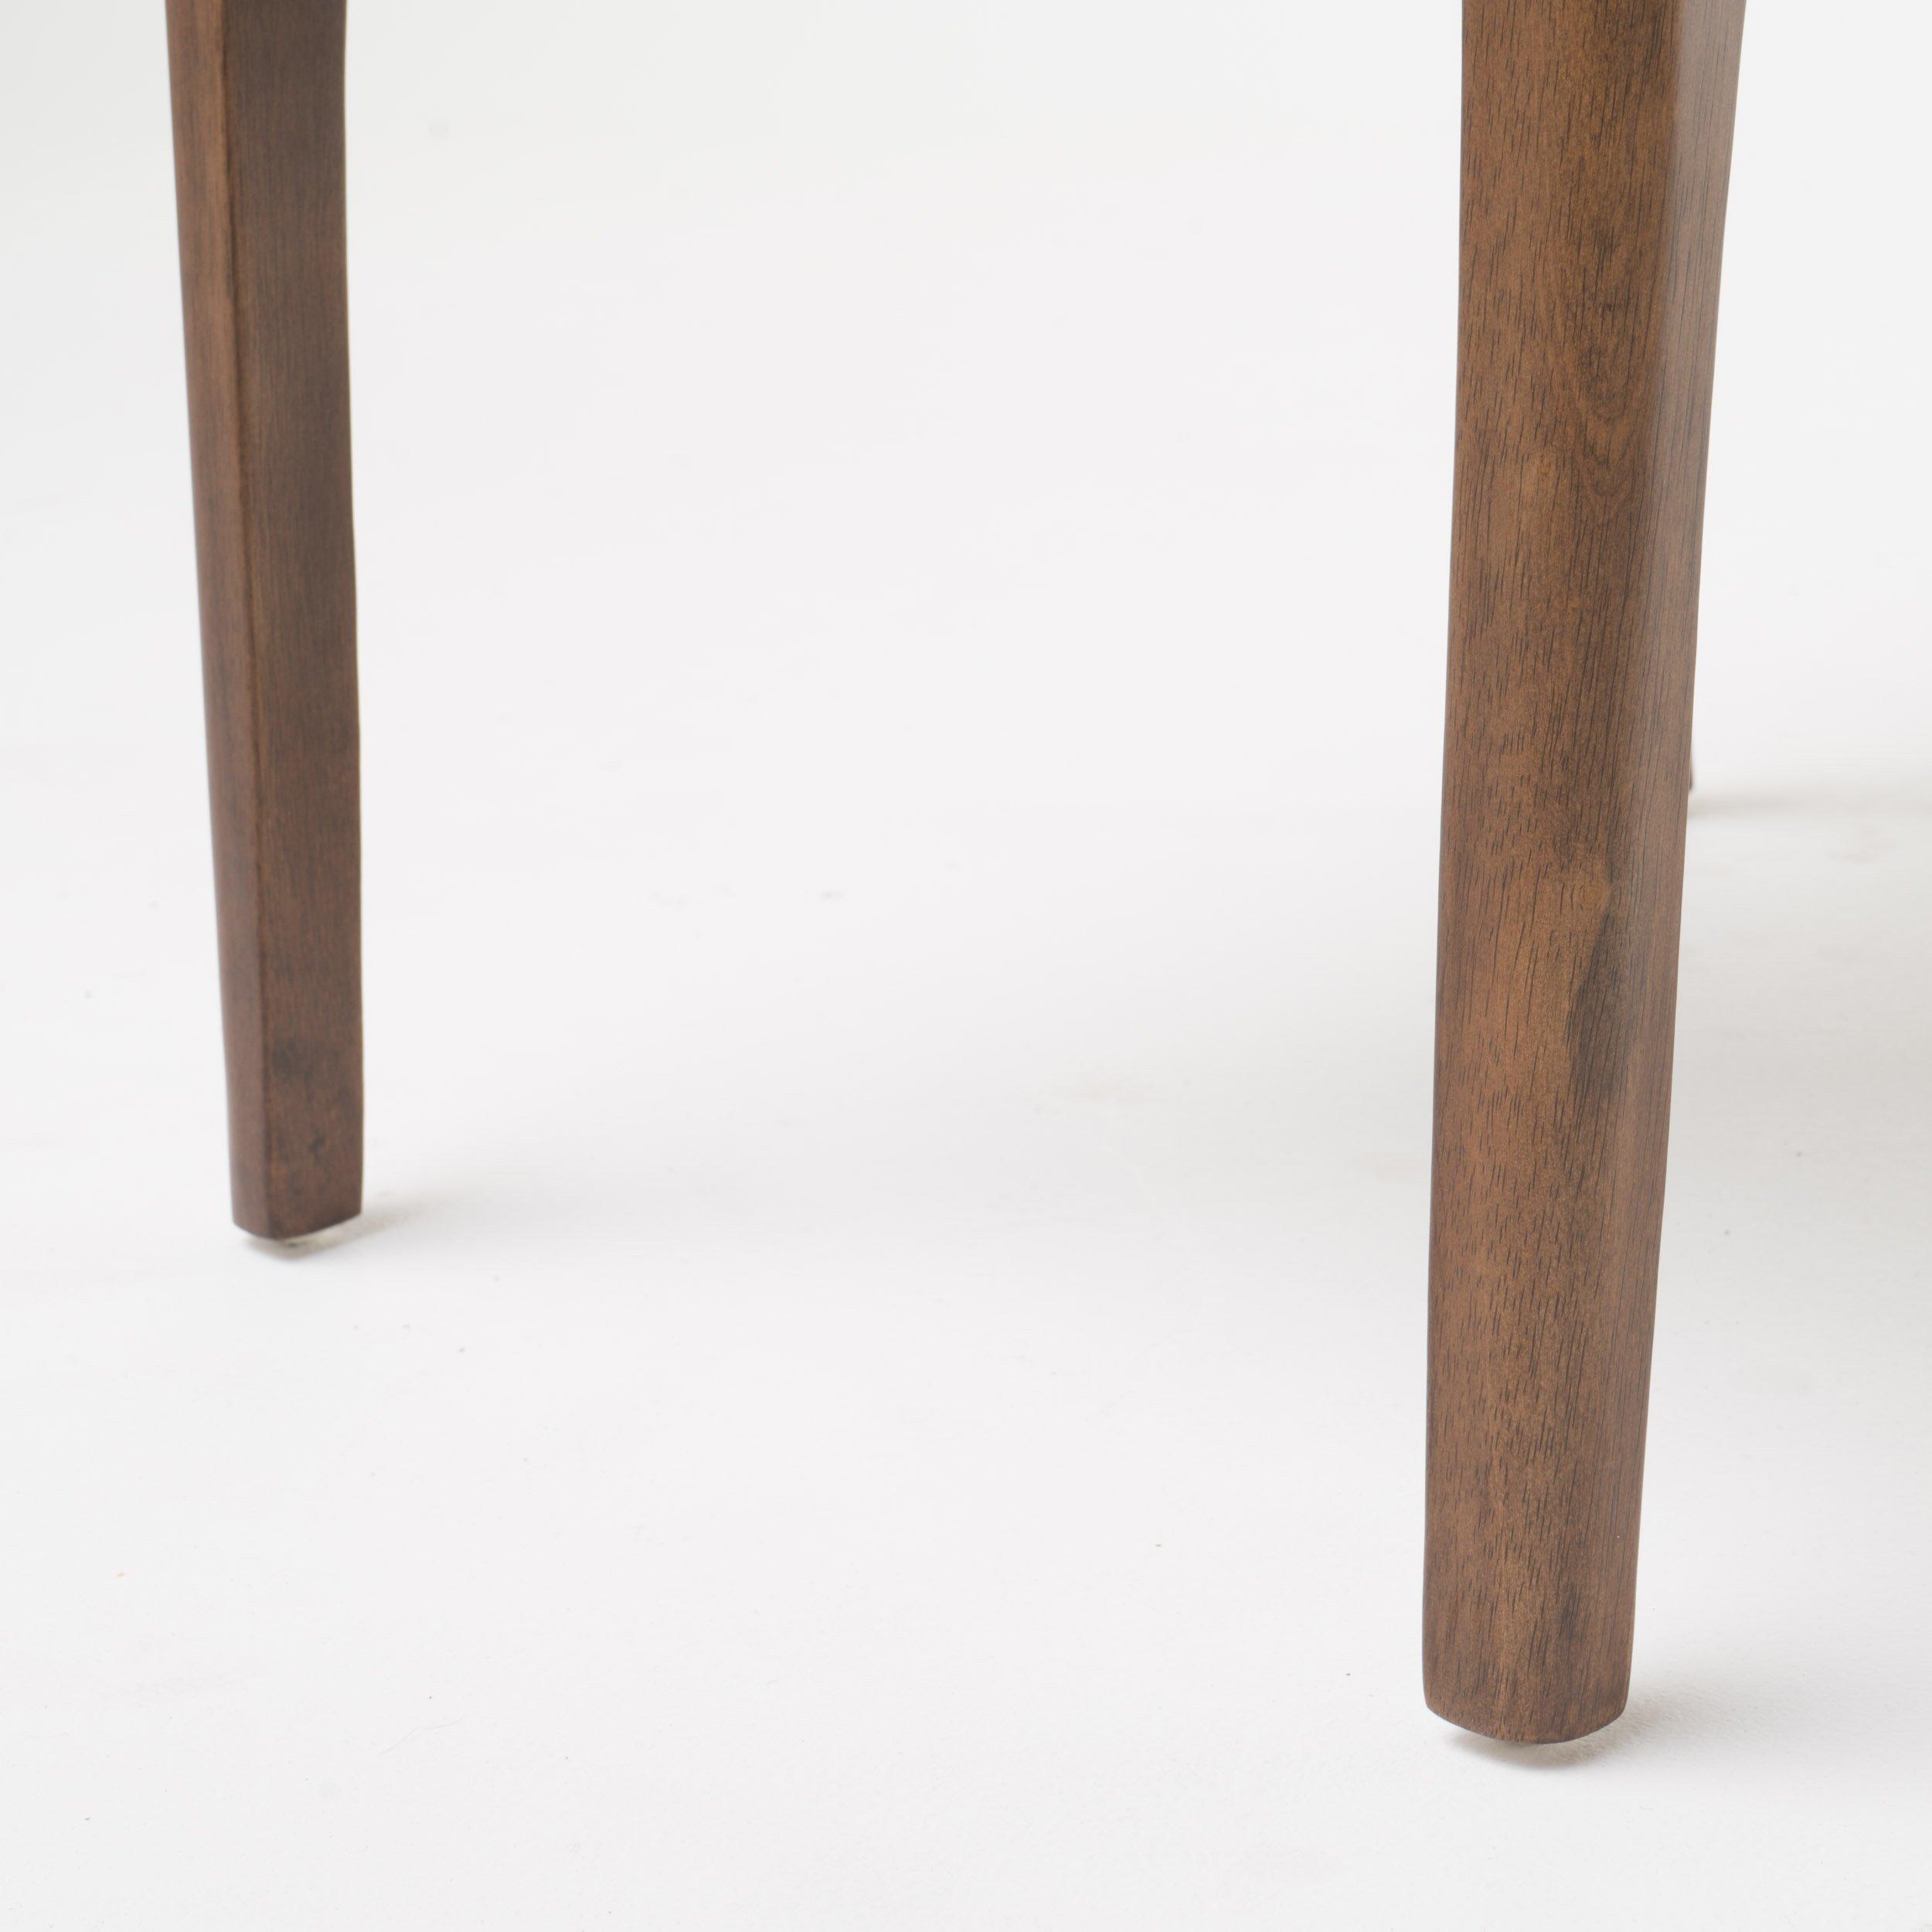 Katherine Dark Grey Fabric/Natural Walnut Finish Curved Leg Rectangular 5 Piece Mid Century Modern Dining Set by GDF Studio (Image #6)